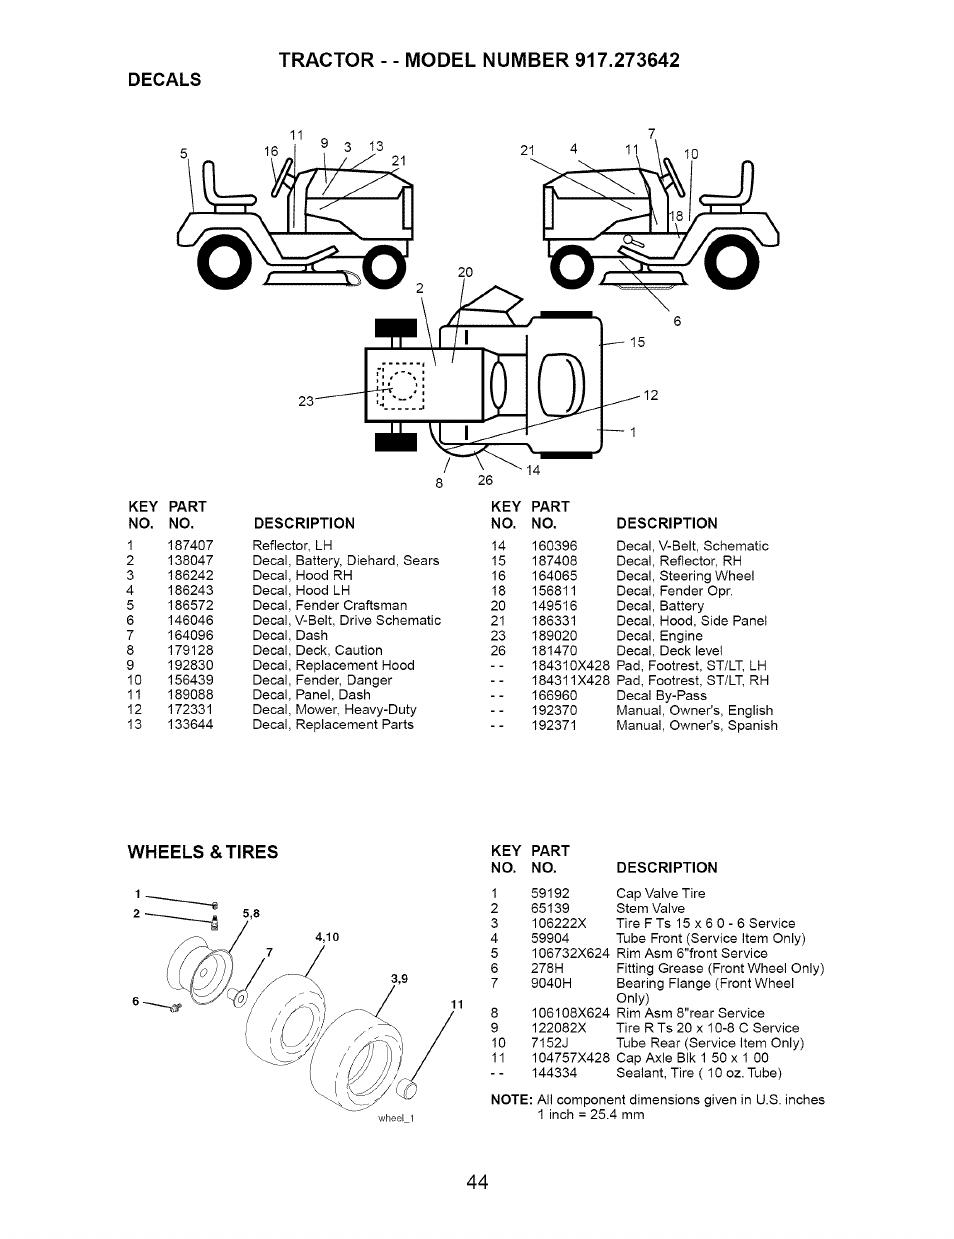 Craftsman Dyt 4000 Manual : Decals wheels tires craftsman dyt  user